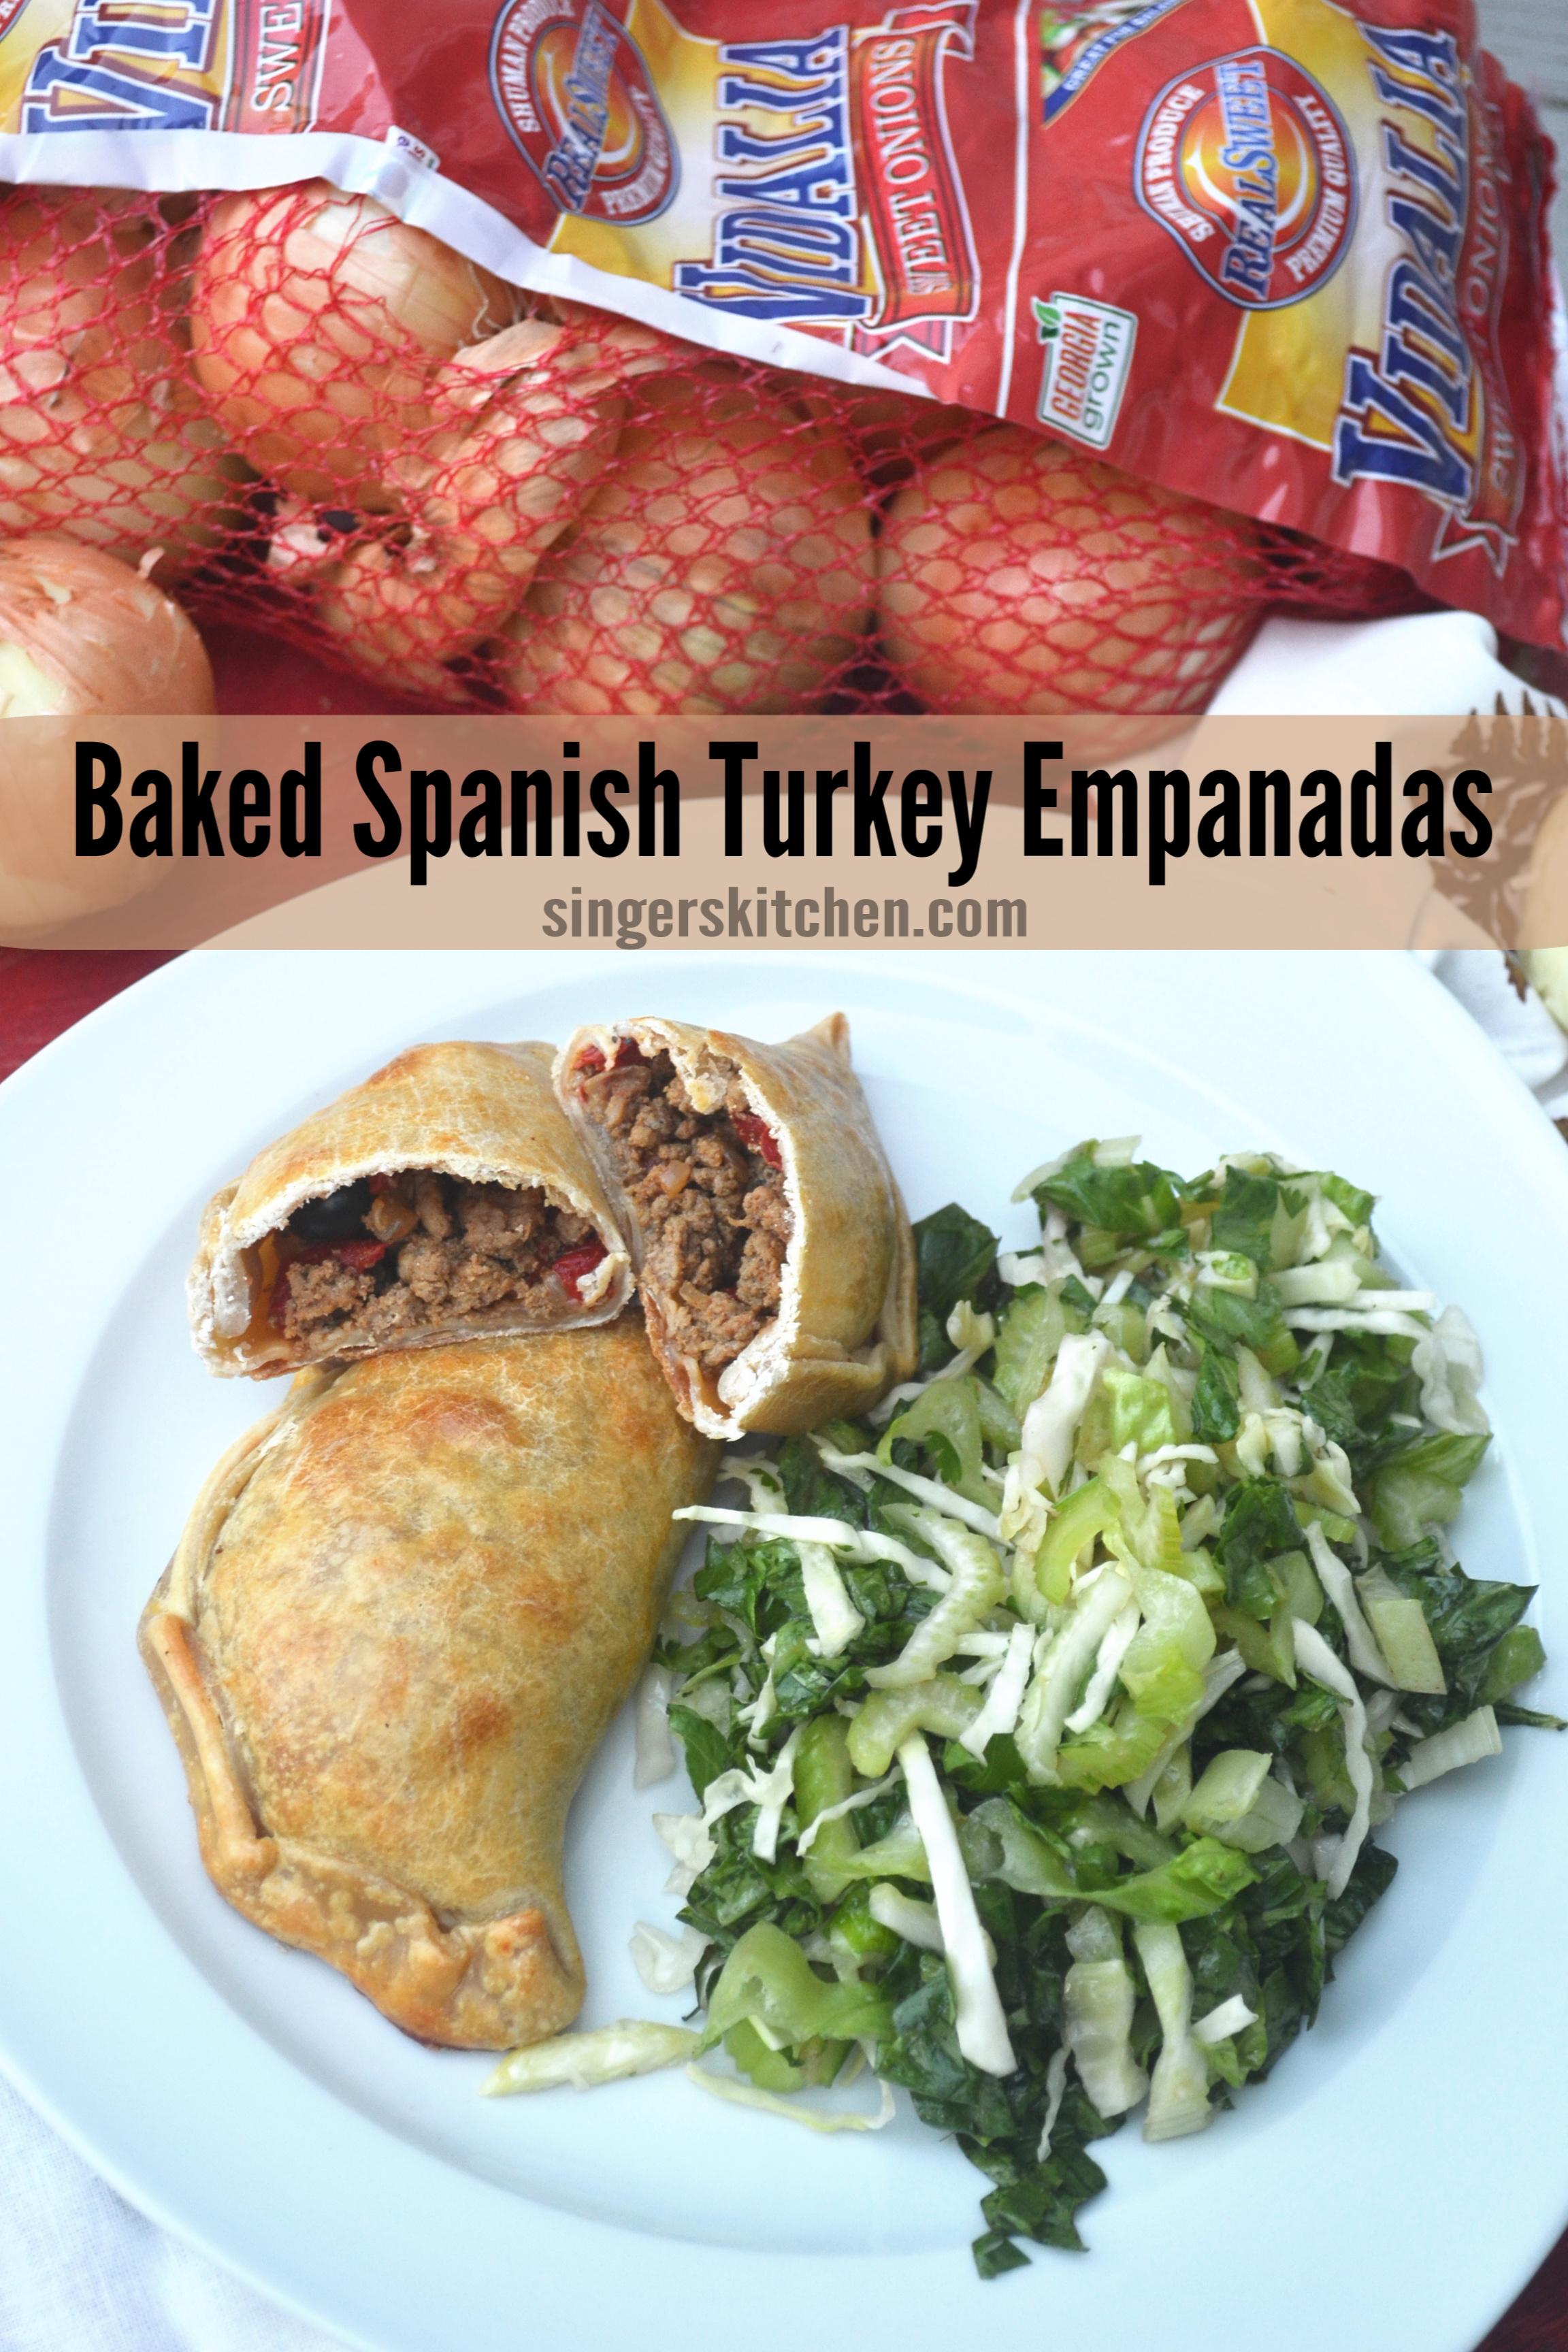 Baked Spanish Turkey Empanadas - hero